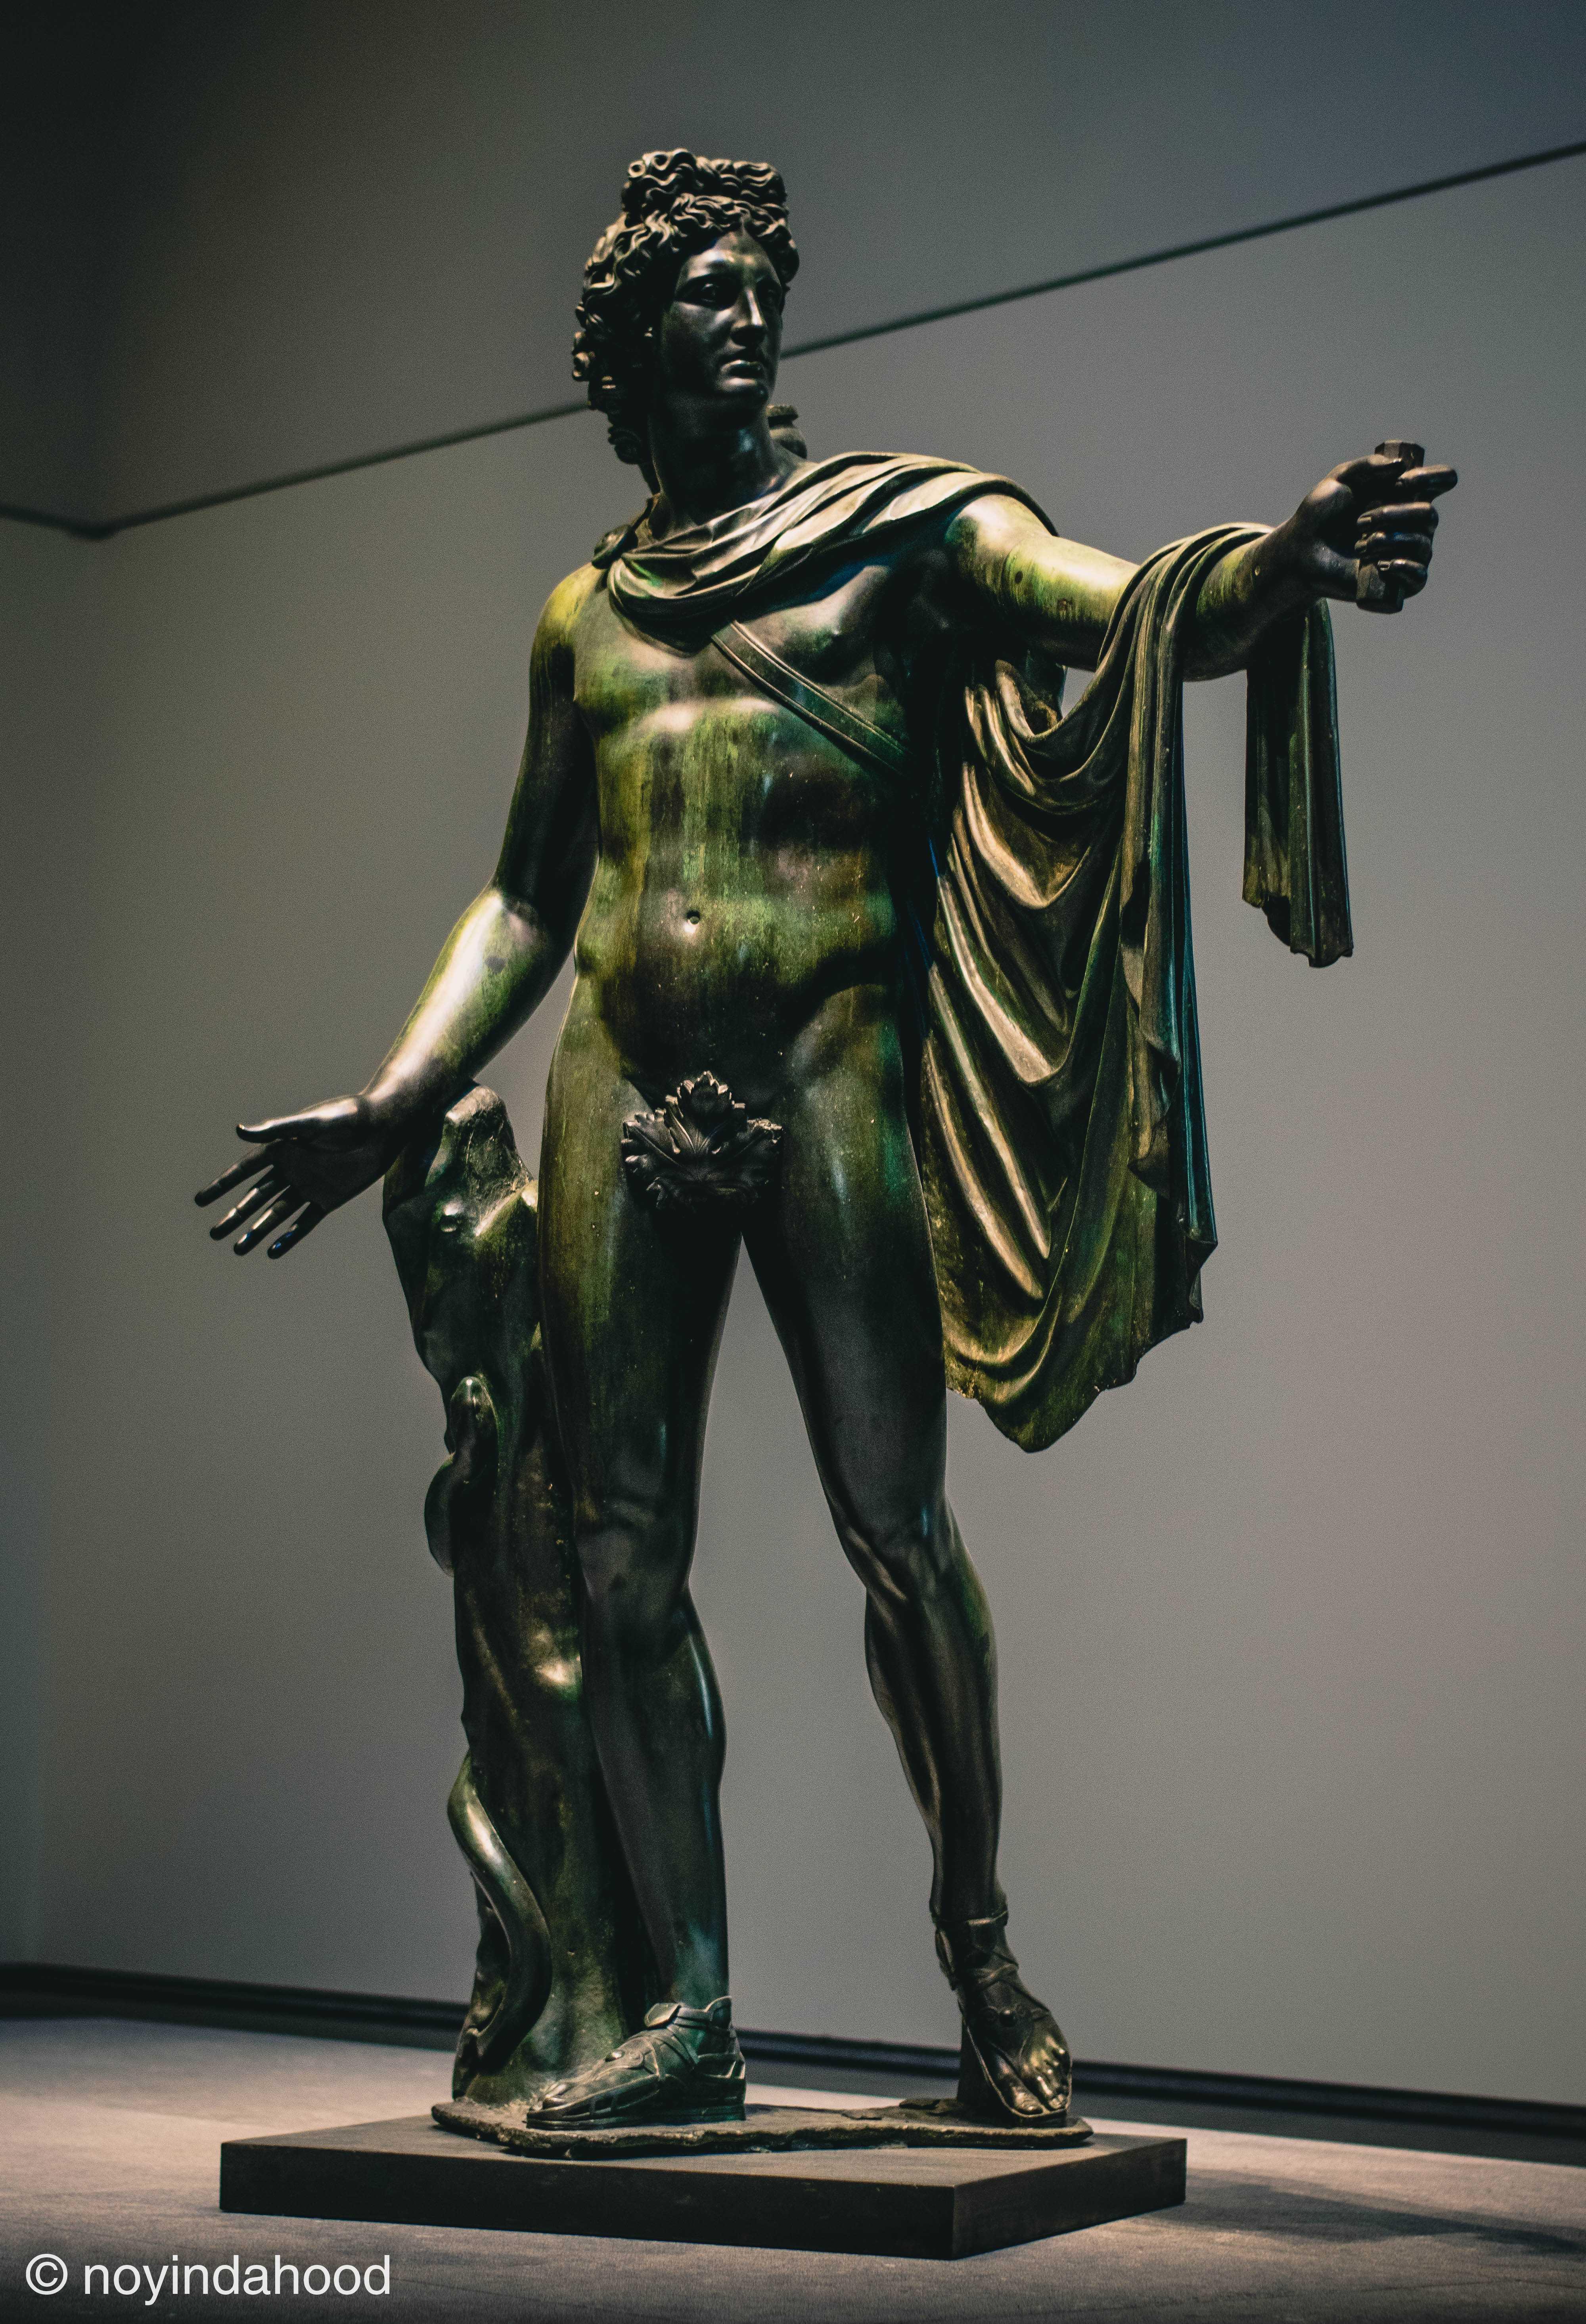 belvedere-apollo-bronze-sculpture-by-leochares